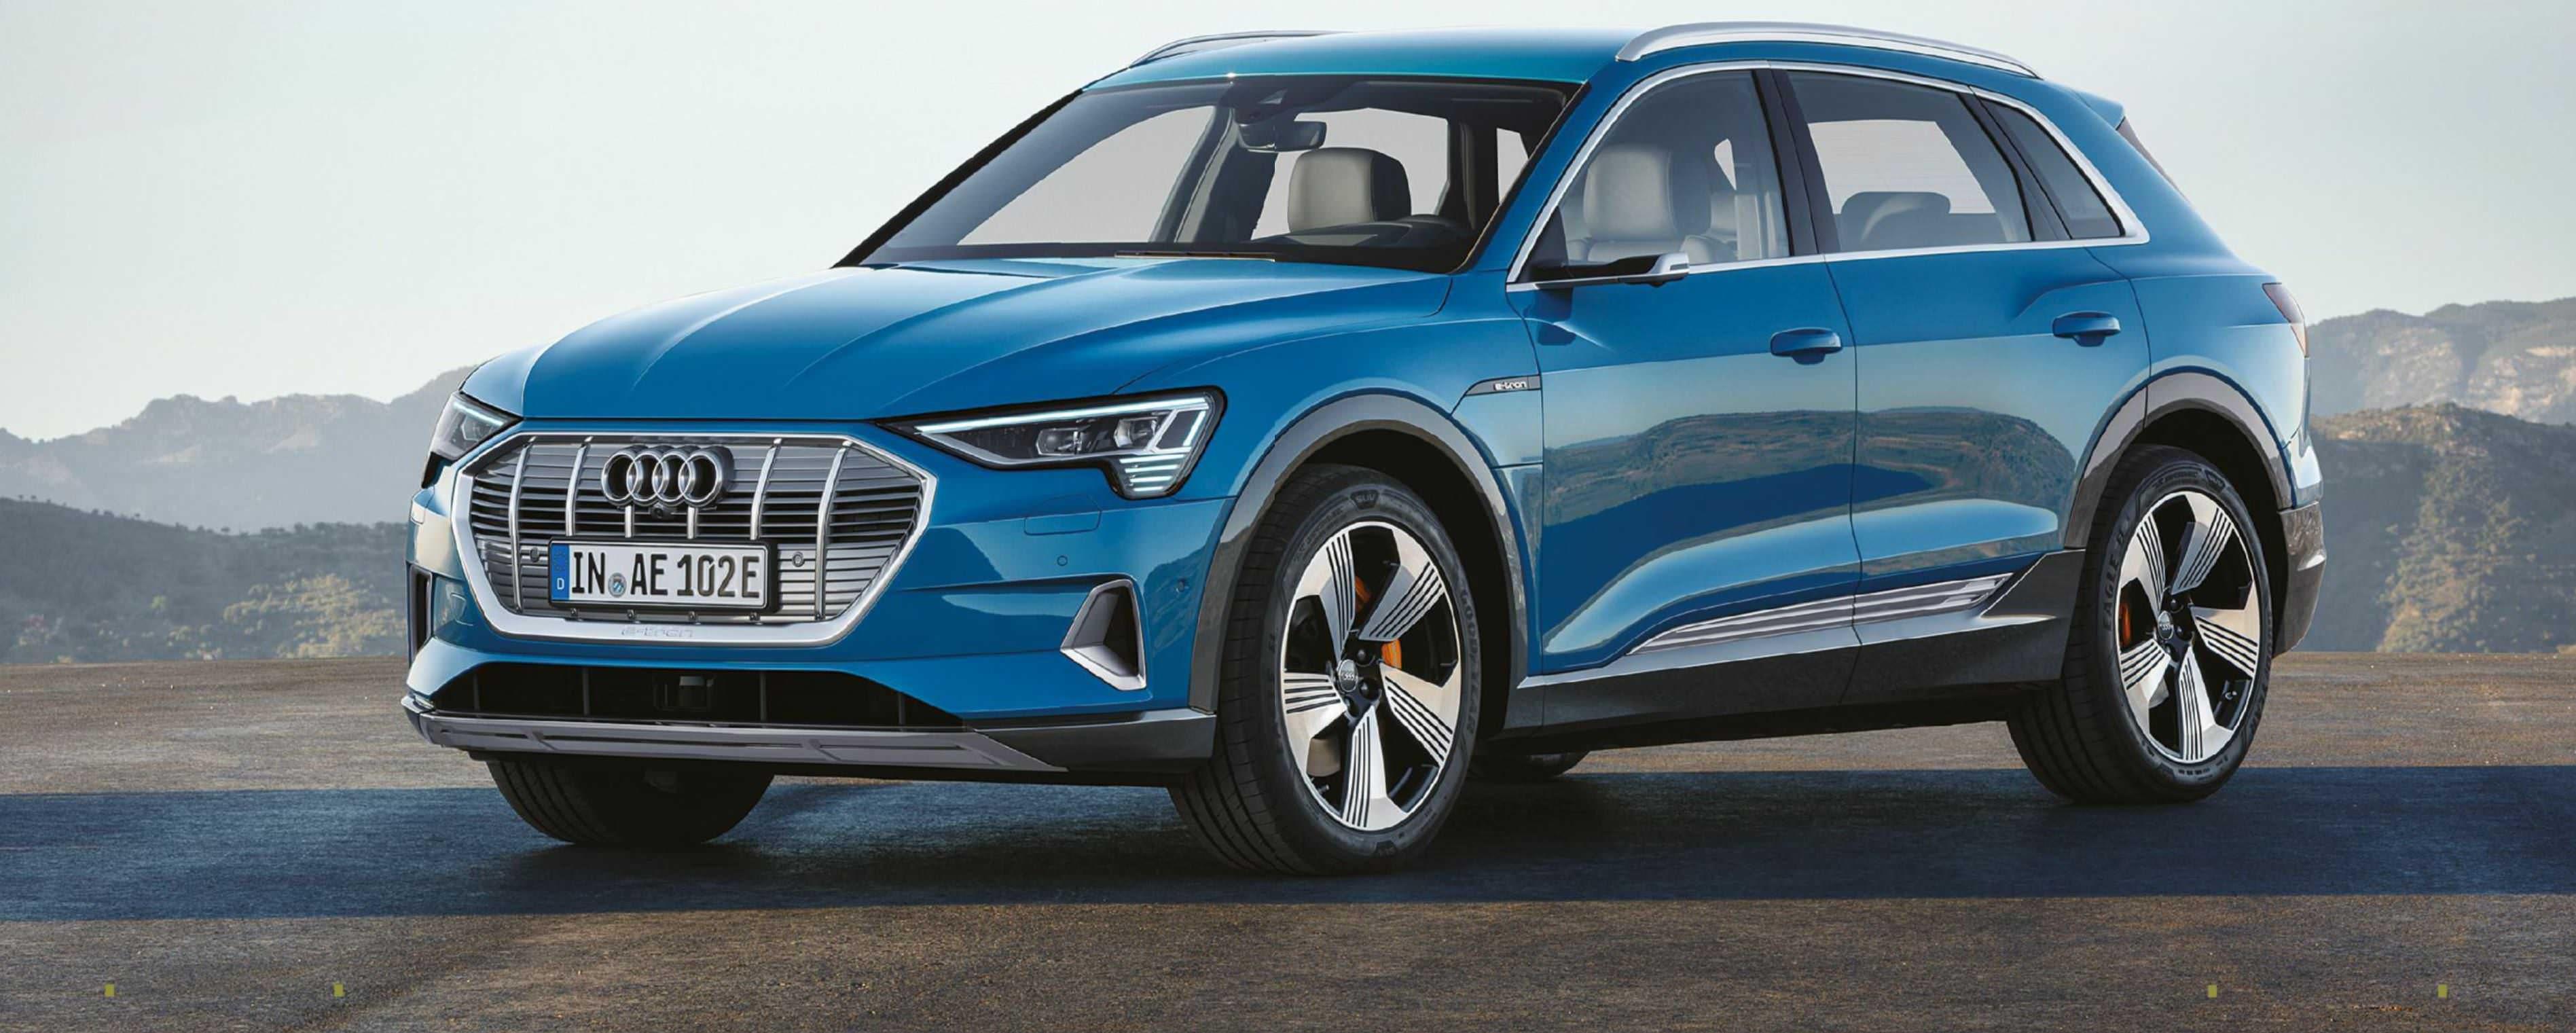 Audi Goes Electric